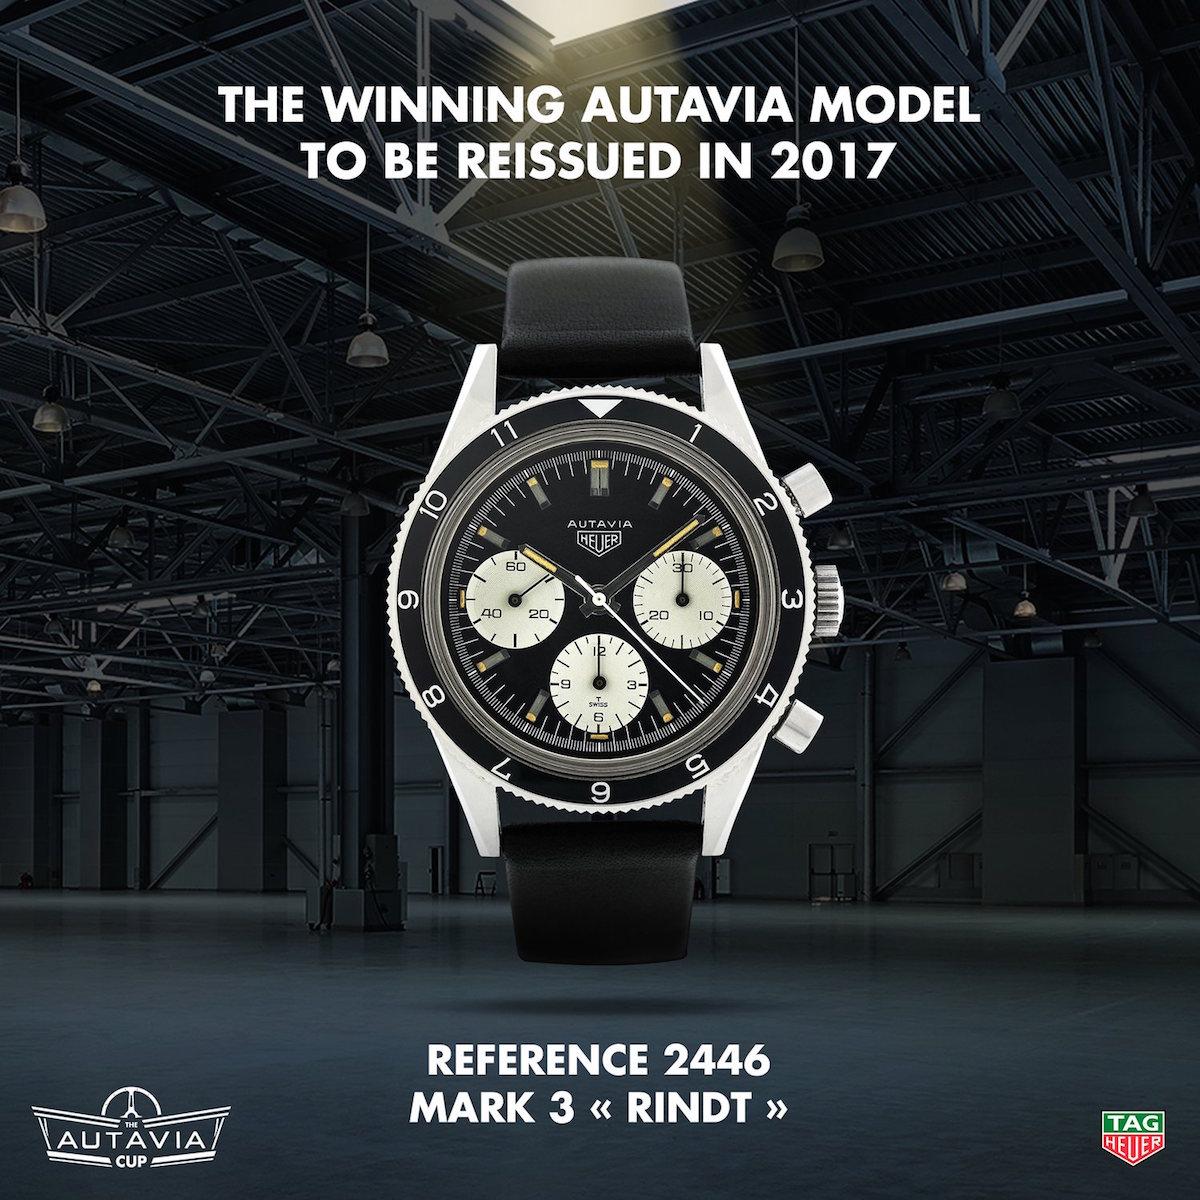 Tag Heuer Autavia Cup Winner - Autavia 2446 Mark 3 Jochen Rindt - 2